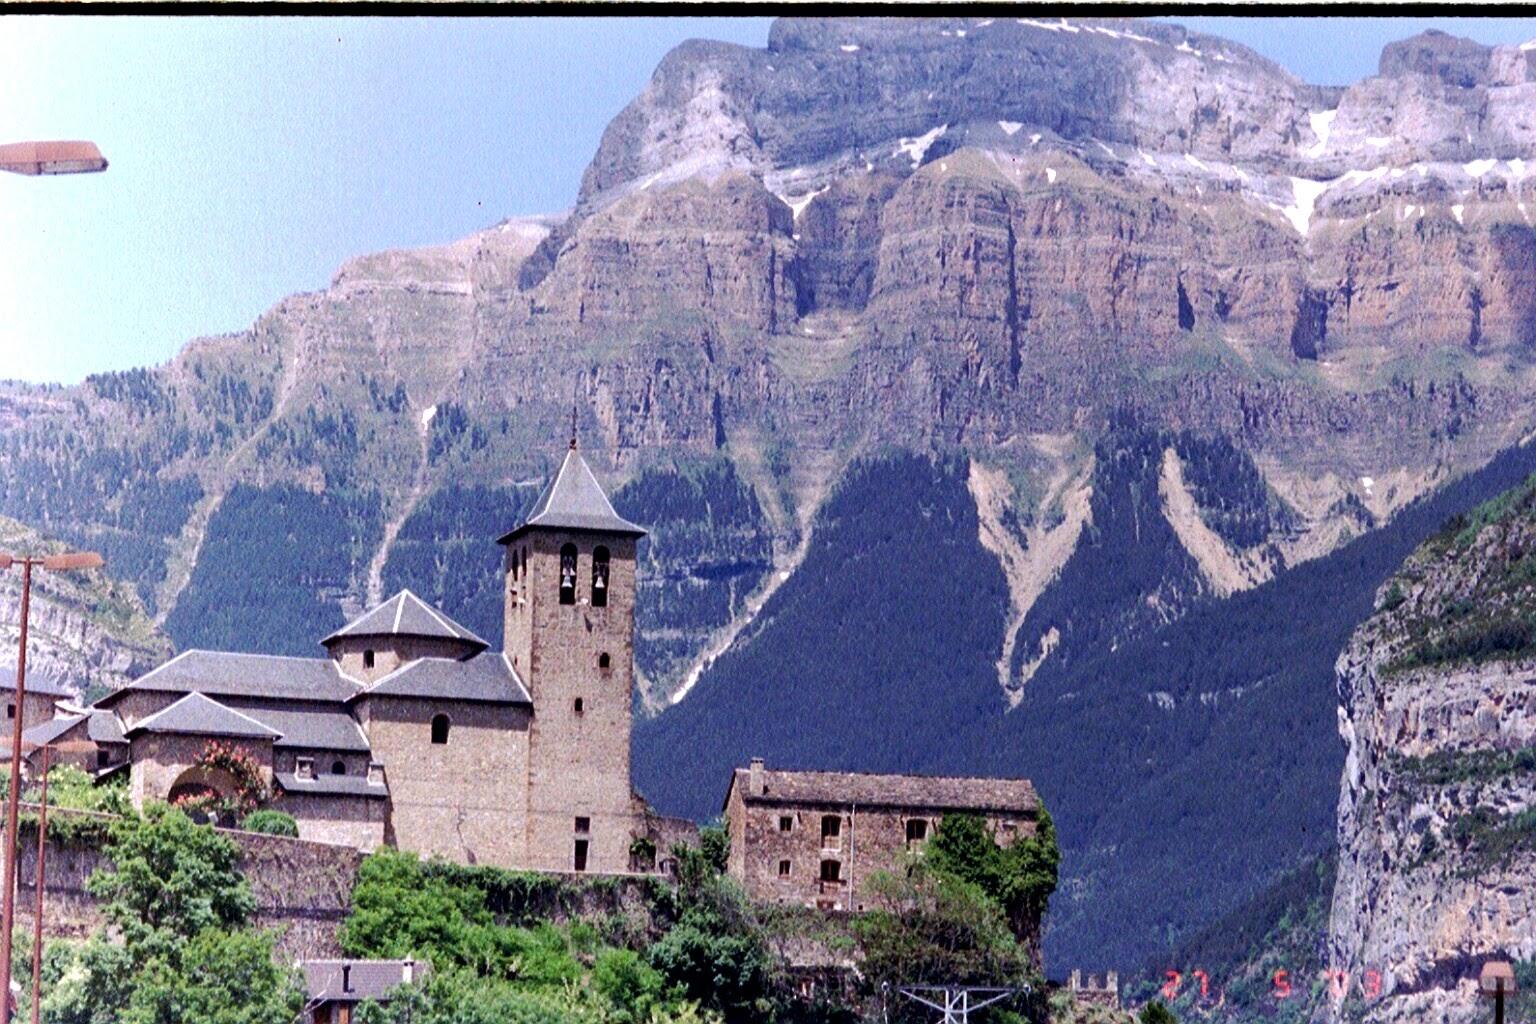 torla-pyrenees-spain-03_4306420112_o.jpg